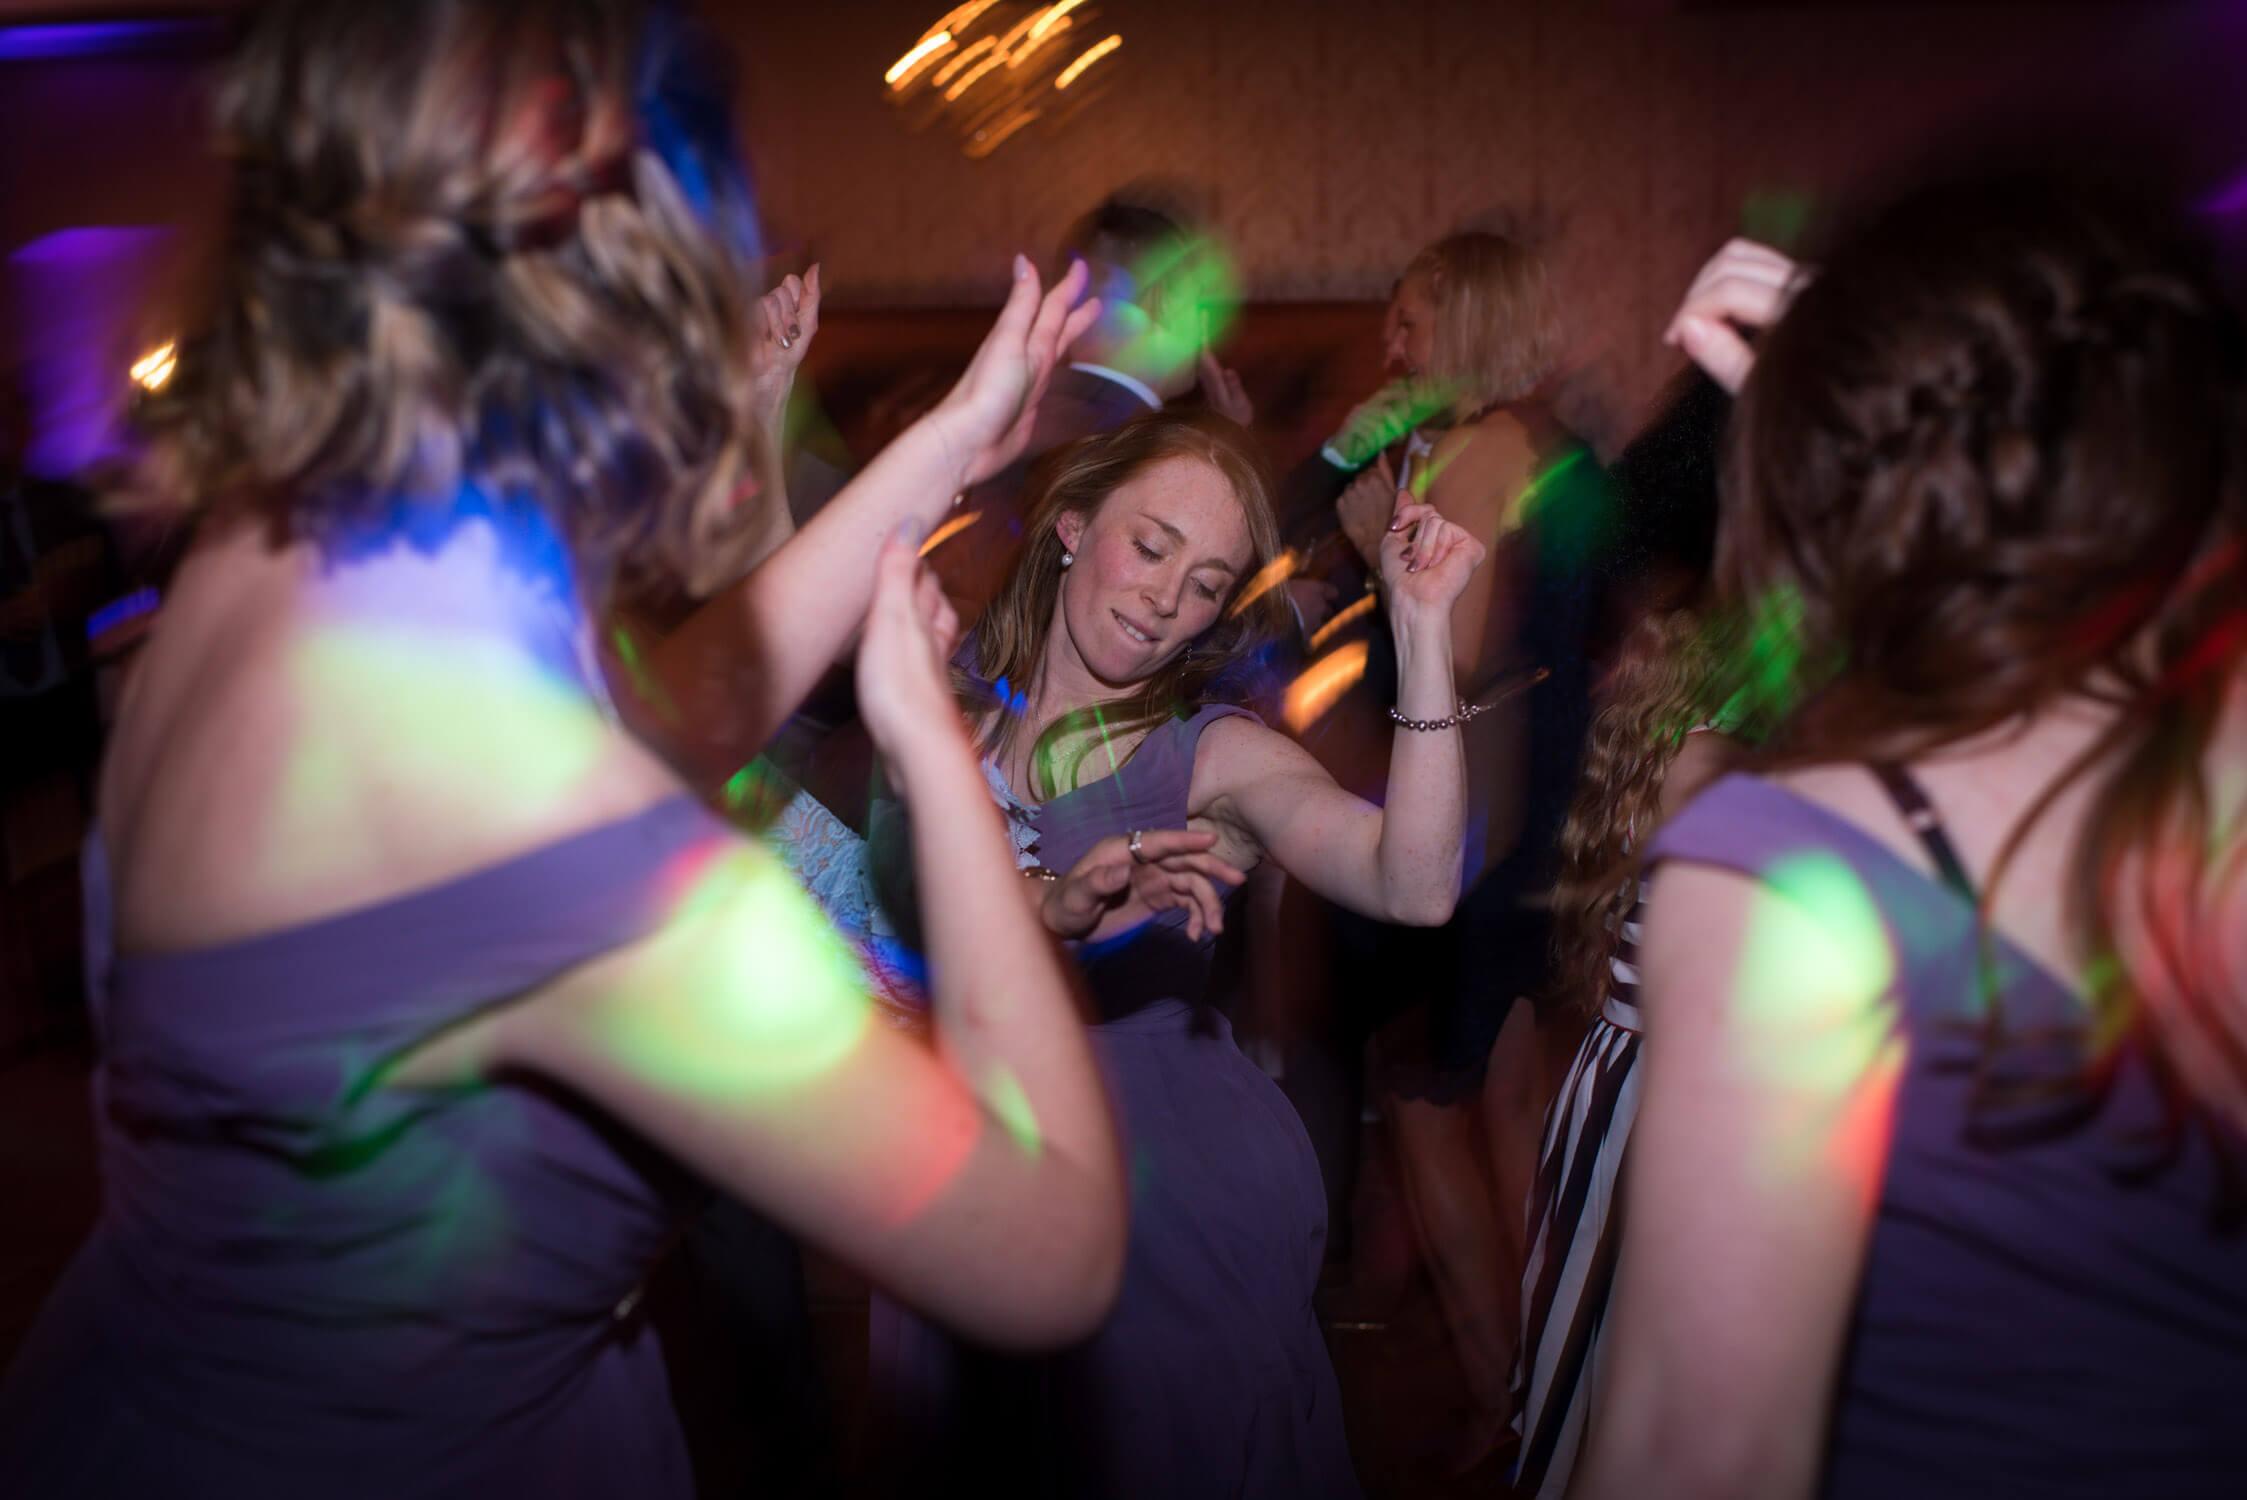 dancefloor at tylney hall